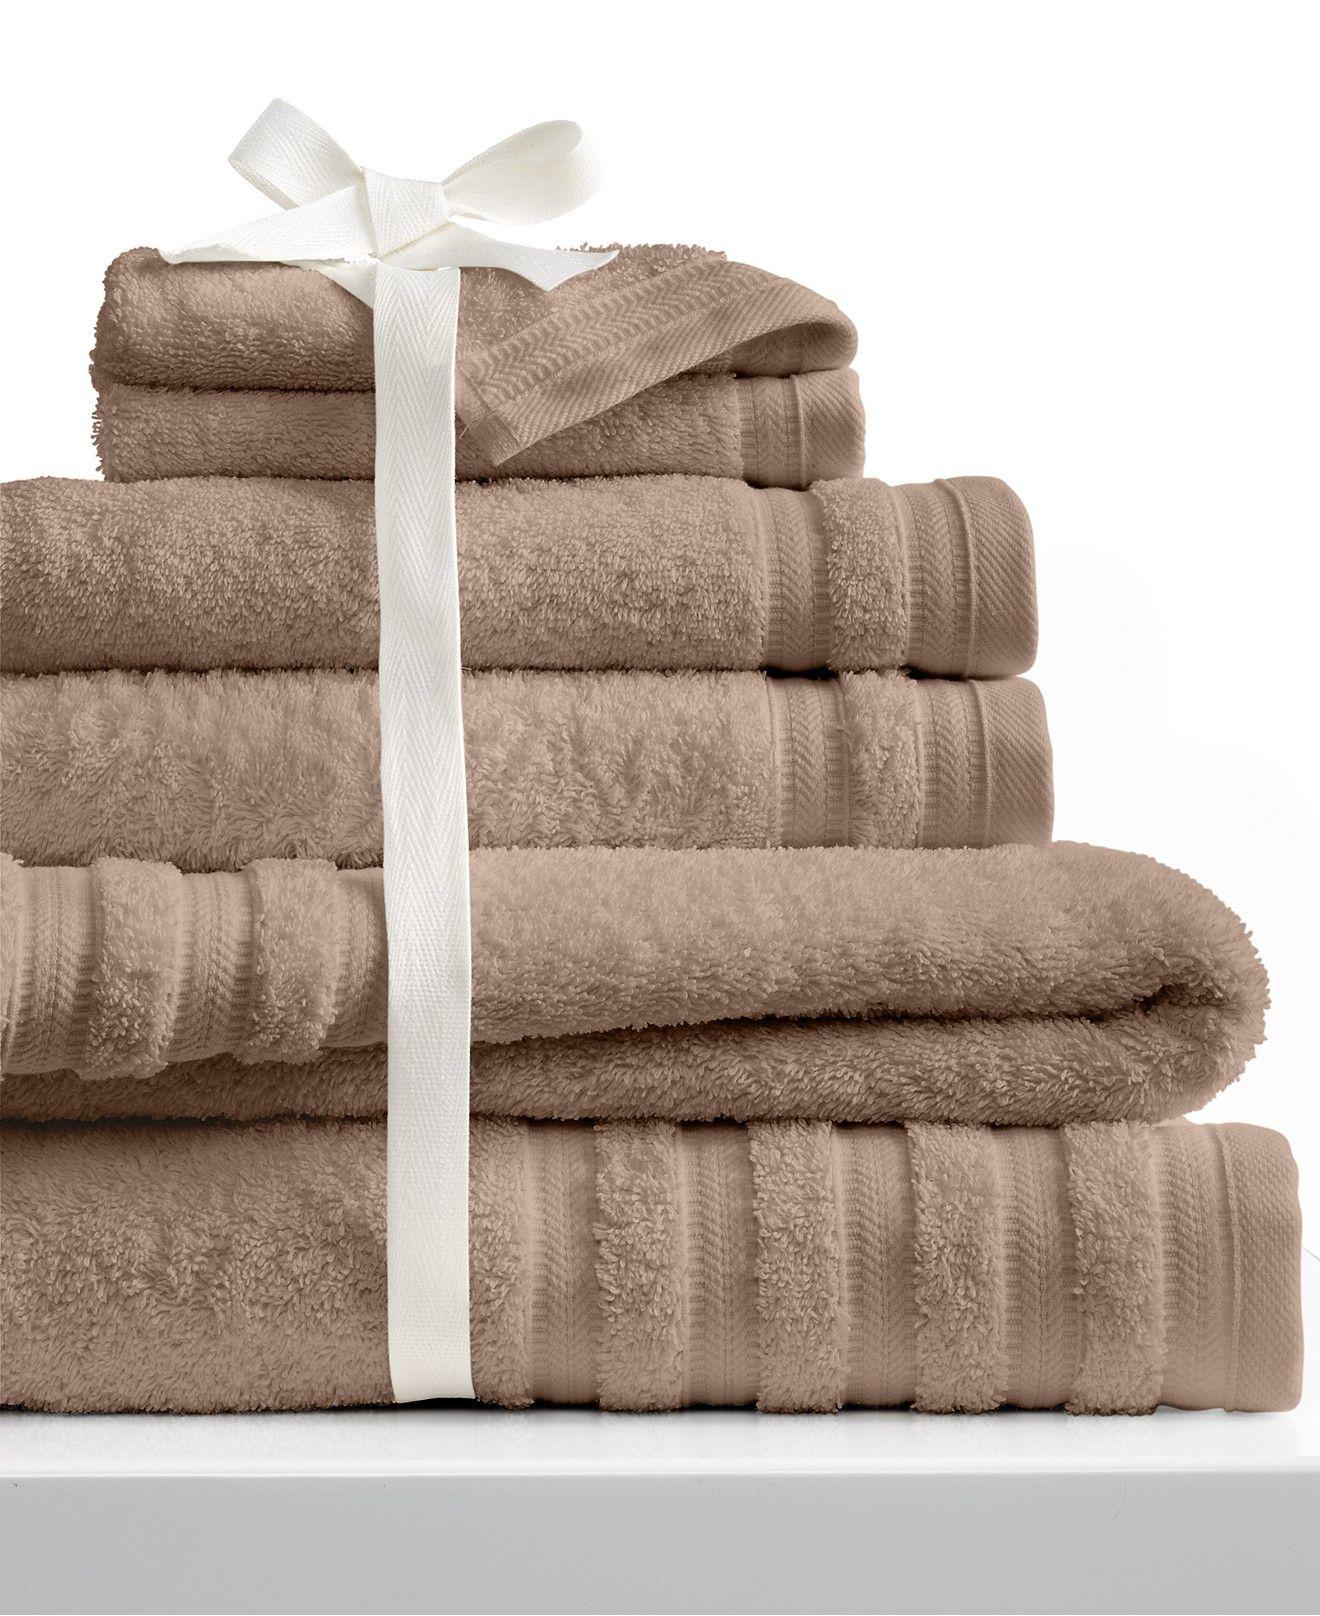 http://www.homefavour.com/category/Bath-Towels/ Baltic Linens Turkish Pure Elegance 6-Piece Towel Set - Bath Towels - Bed & Bath - Macy's